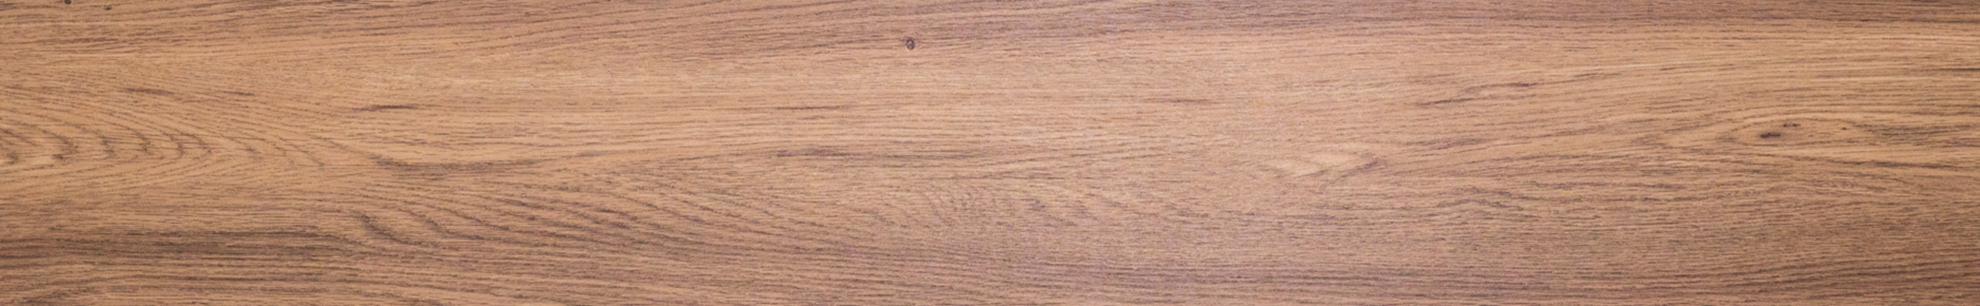 Виниловая плитка NOX EcoClick - EcoWood DryBack Дуб Виши